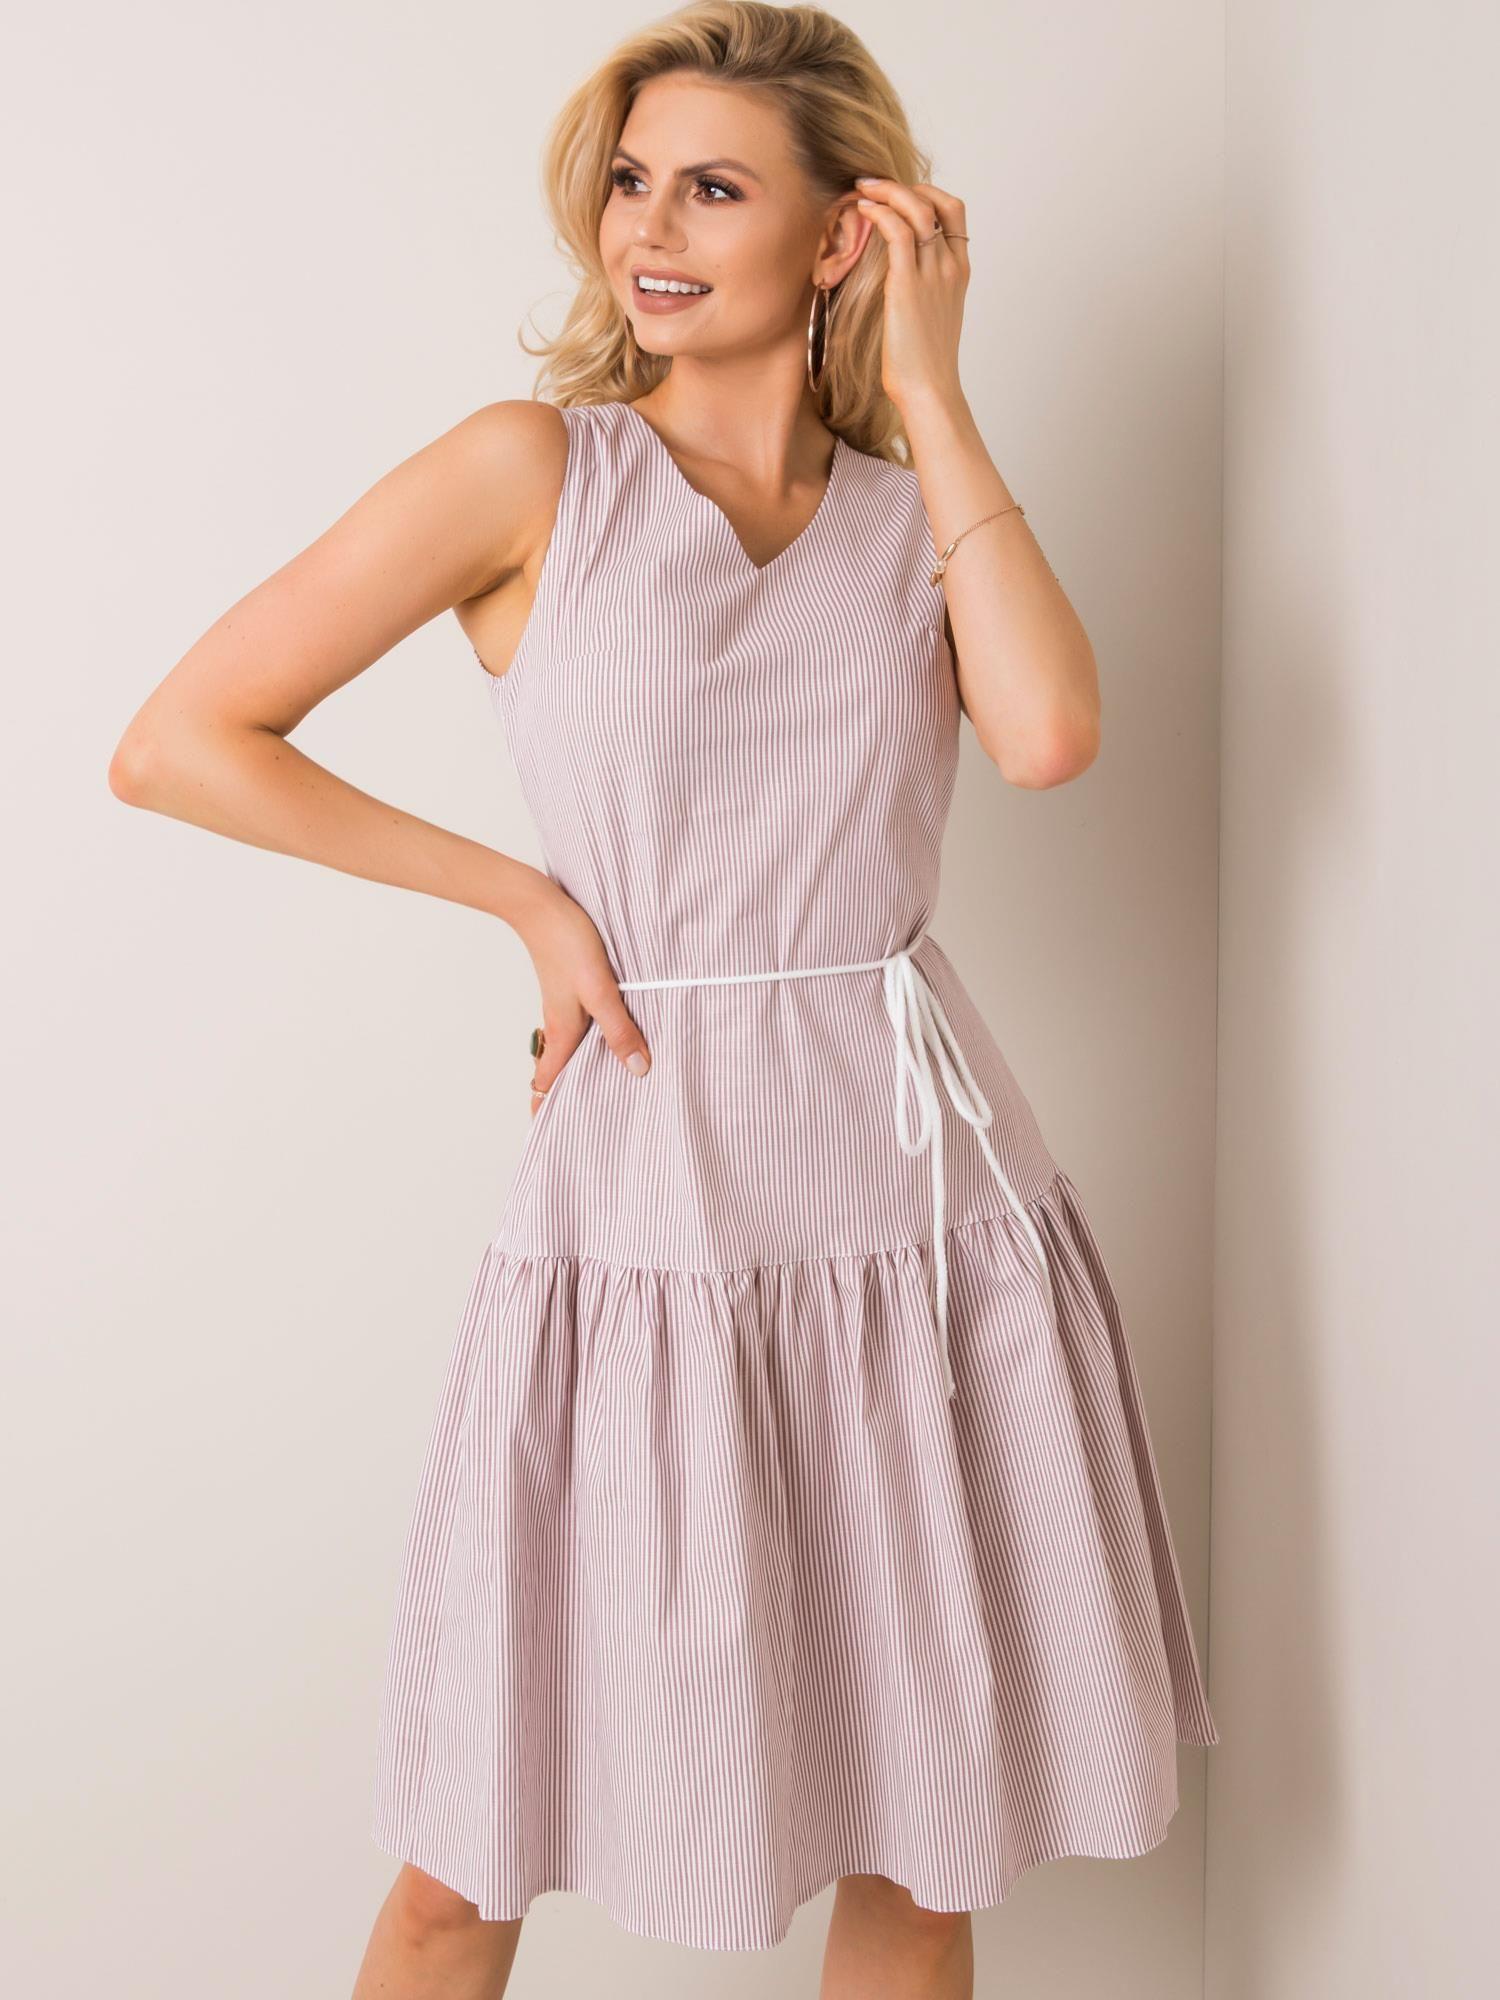 Dámske béžovo-biele pruhované šaty - 40